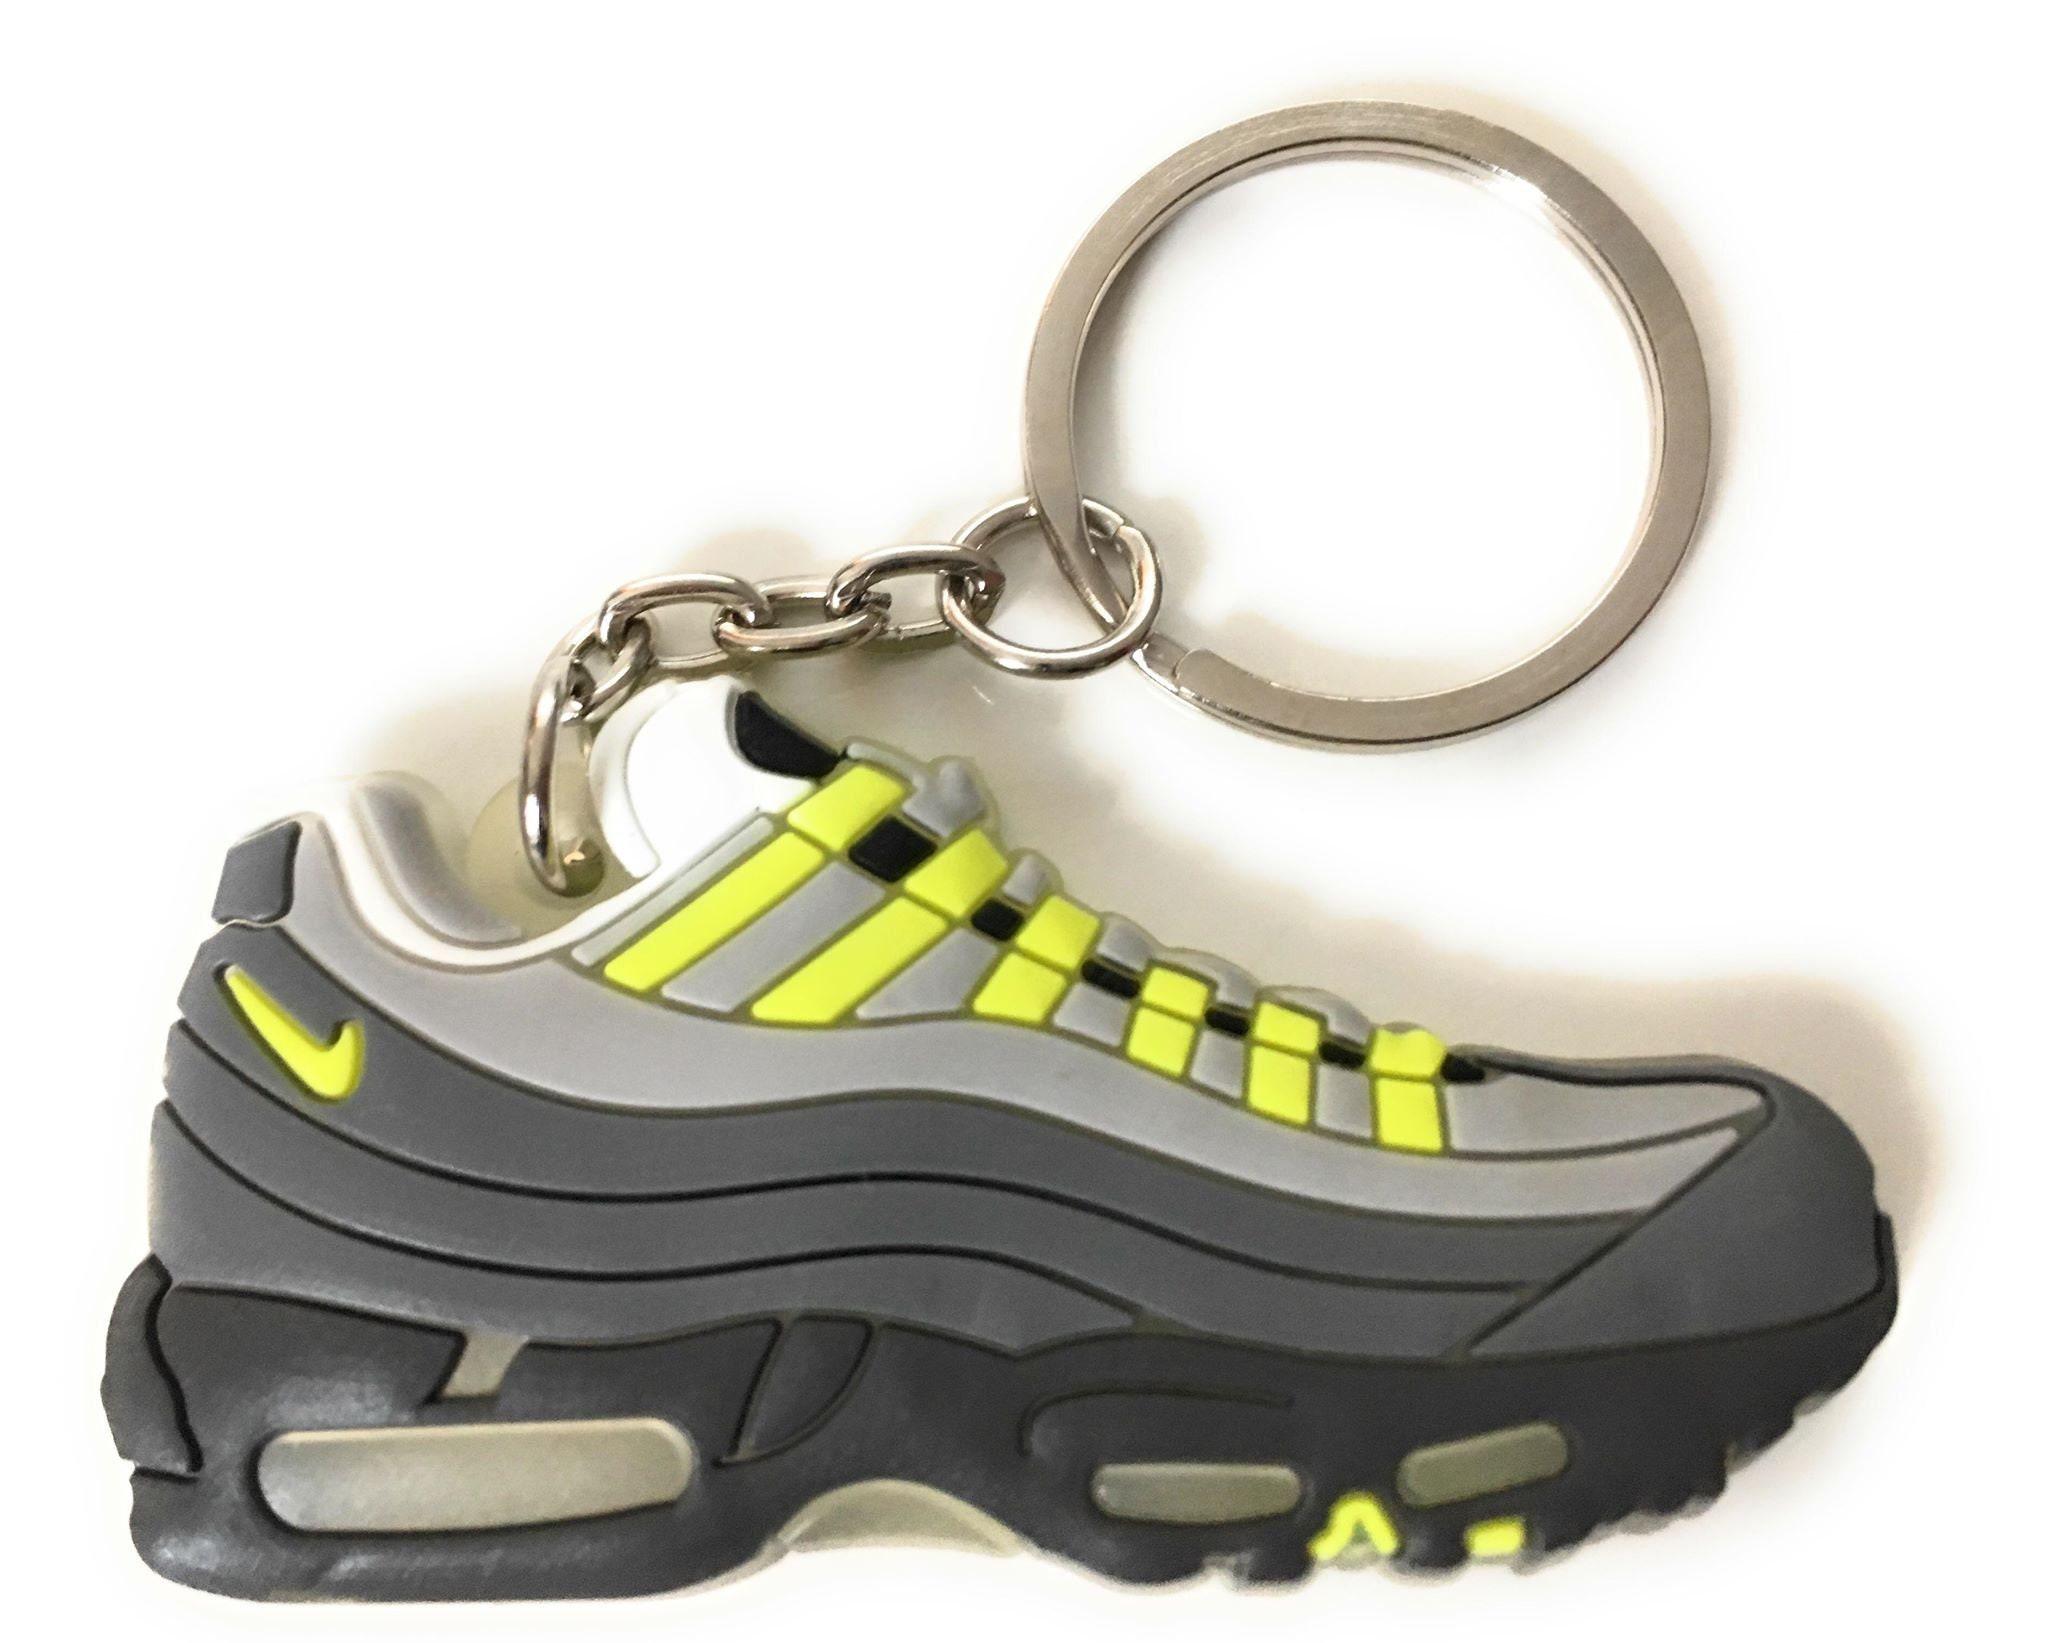 new style 9a46b e8060 Nike Air Max 95 OG Keychain Neon keychain   Etsy